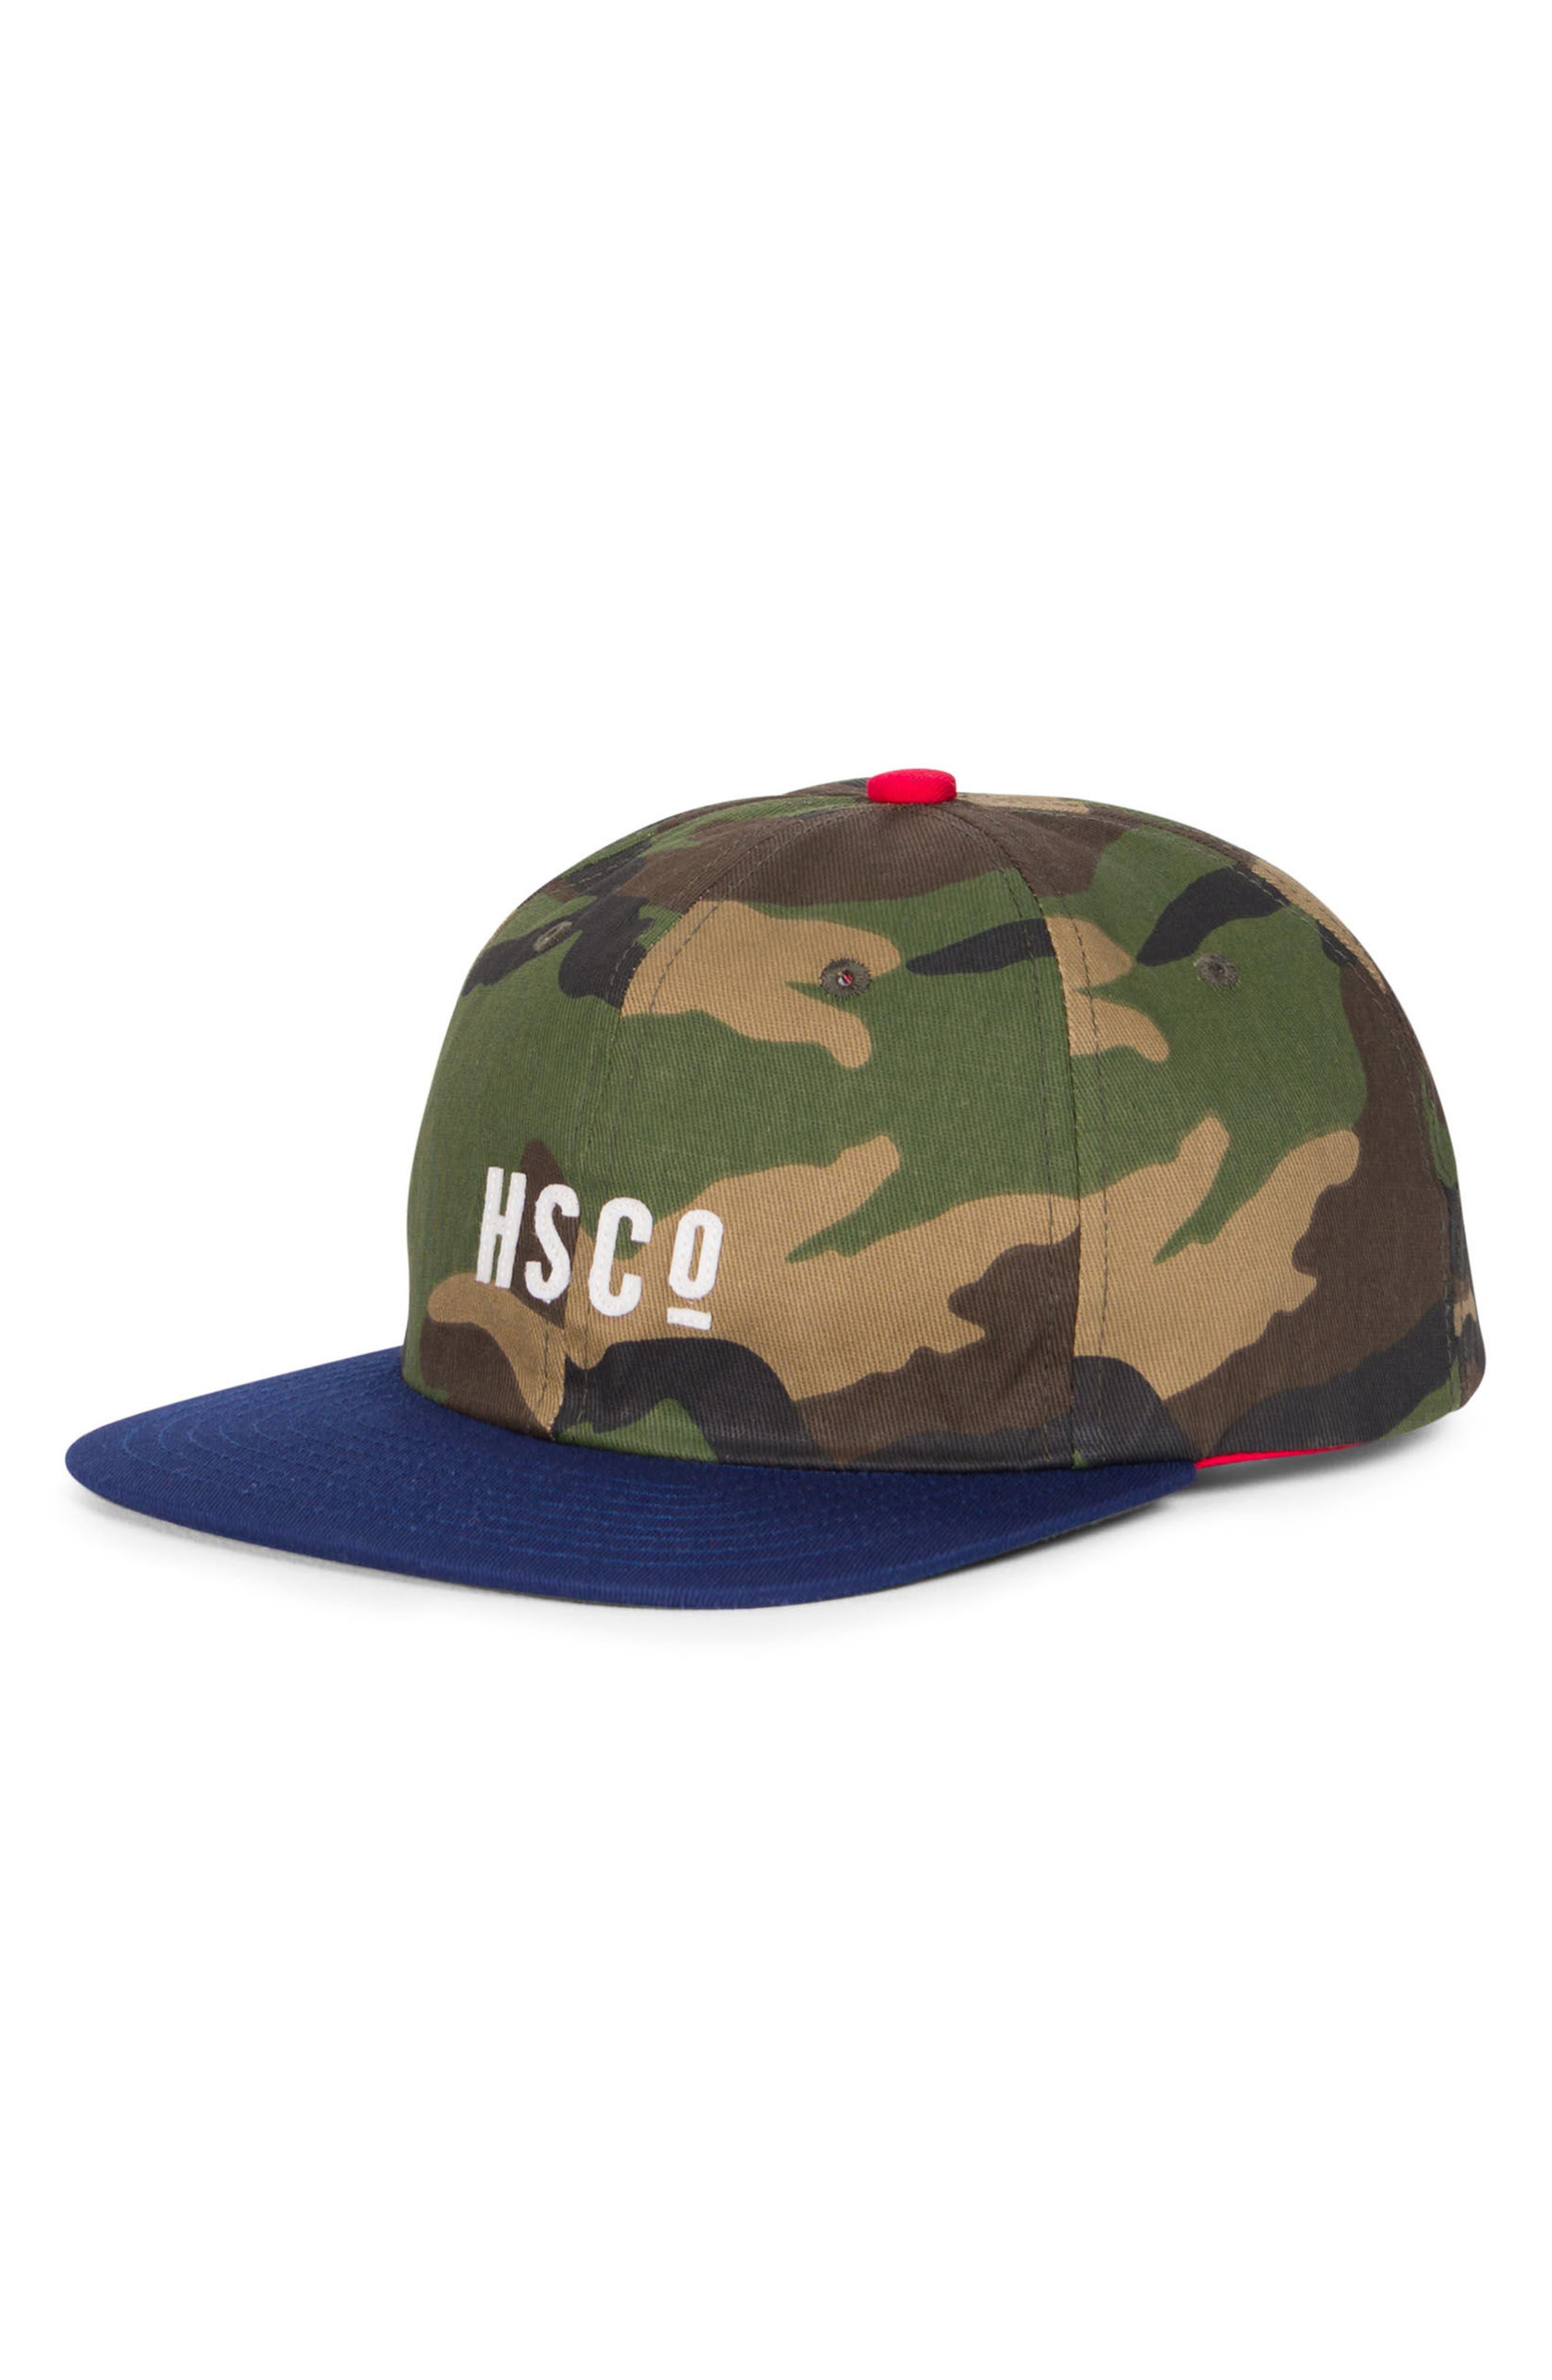 Herschel Supply Co. Mosby Camo Snapback Baseball Cap